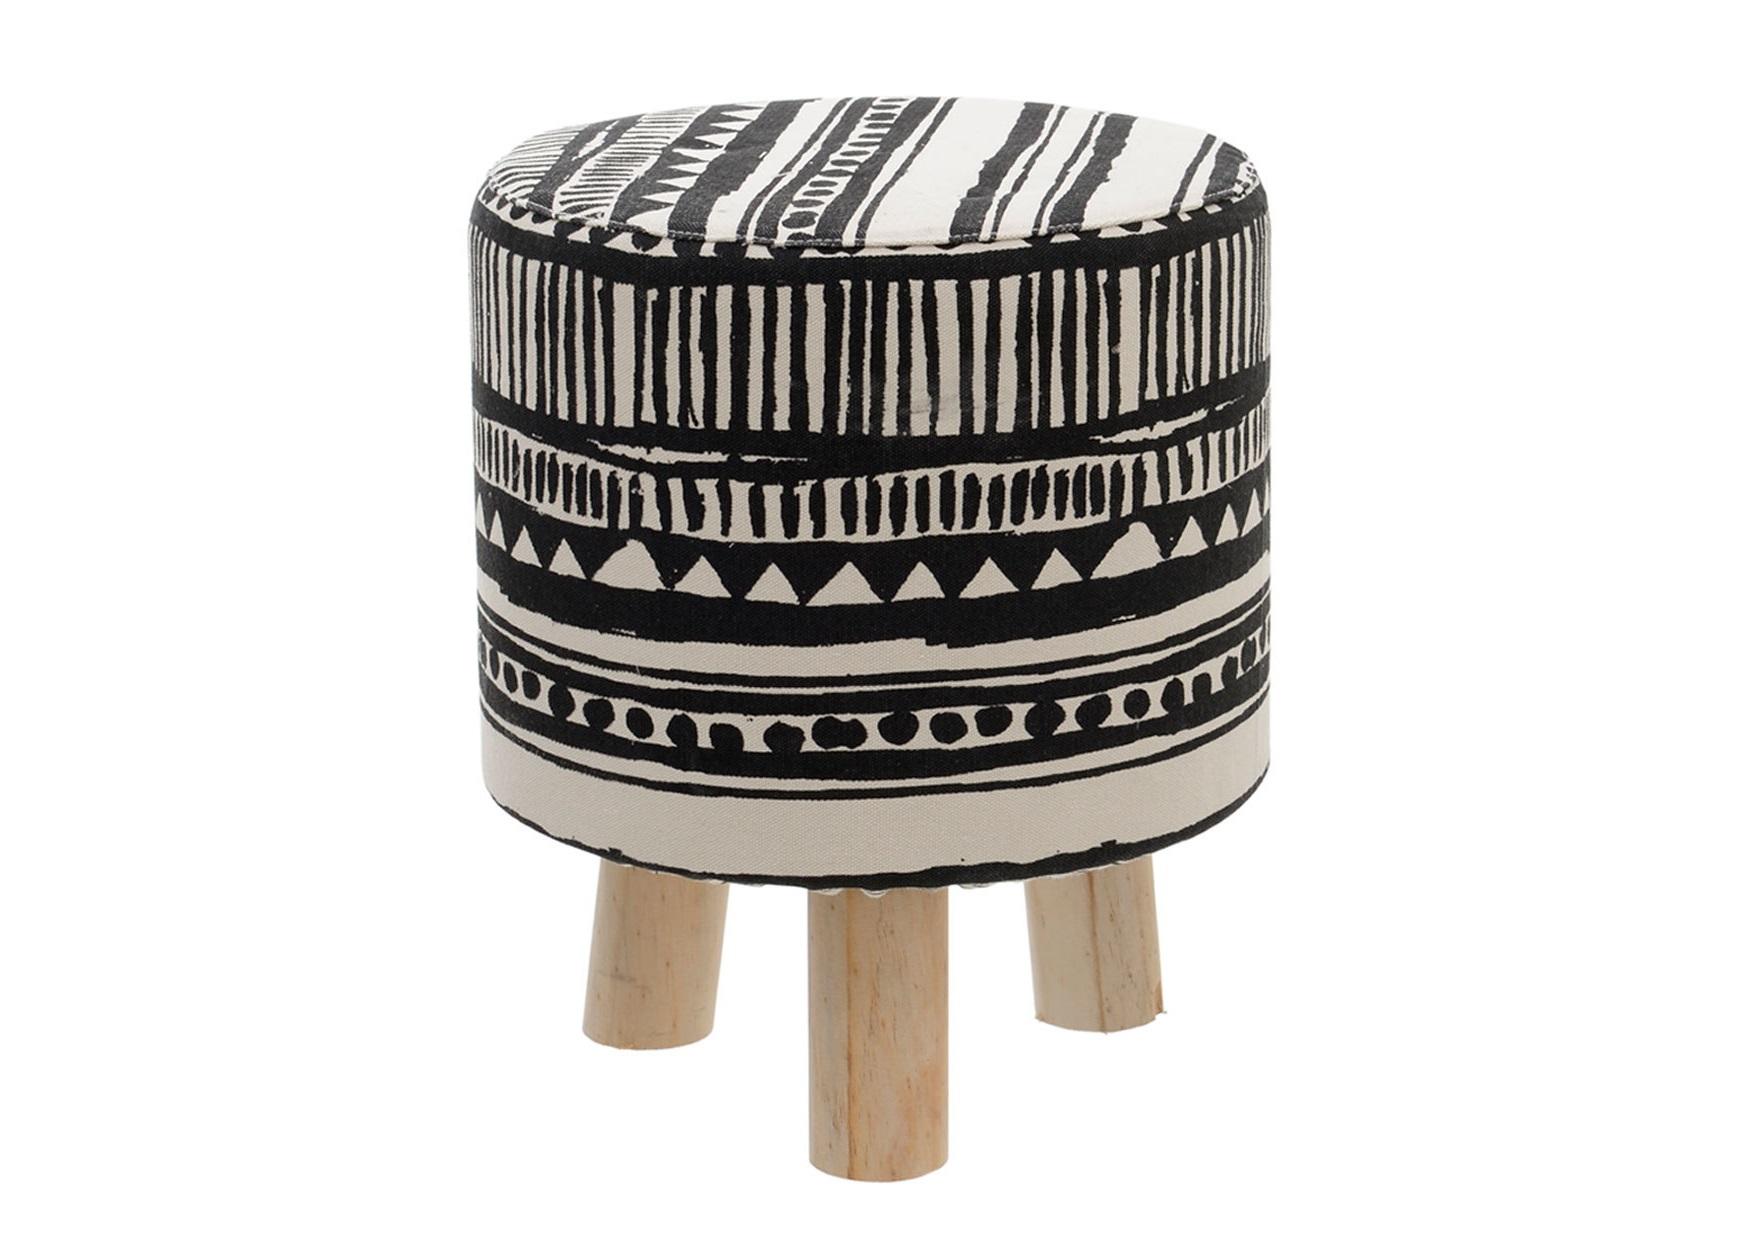 Пуф AfricanФорменные пуфы<br><br><br>Material: Текстиль<br>Ширина см: 37<br>Высота см: 43<br>Глубина см: 37